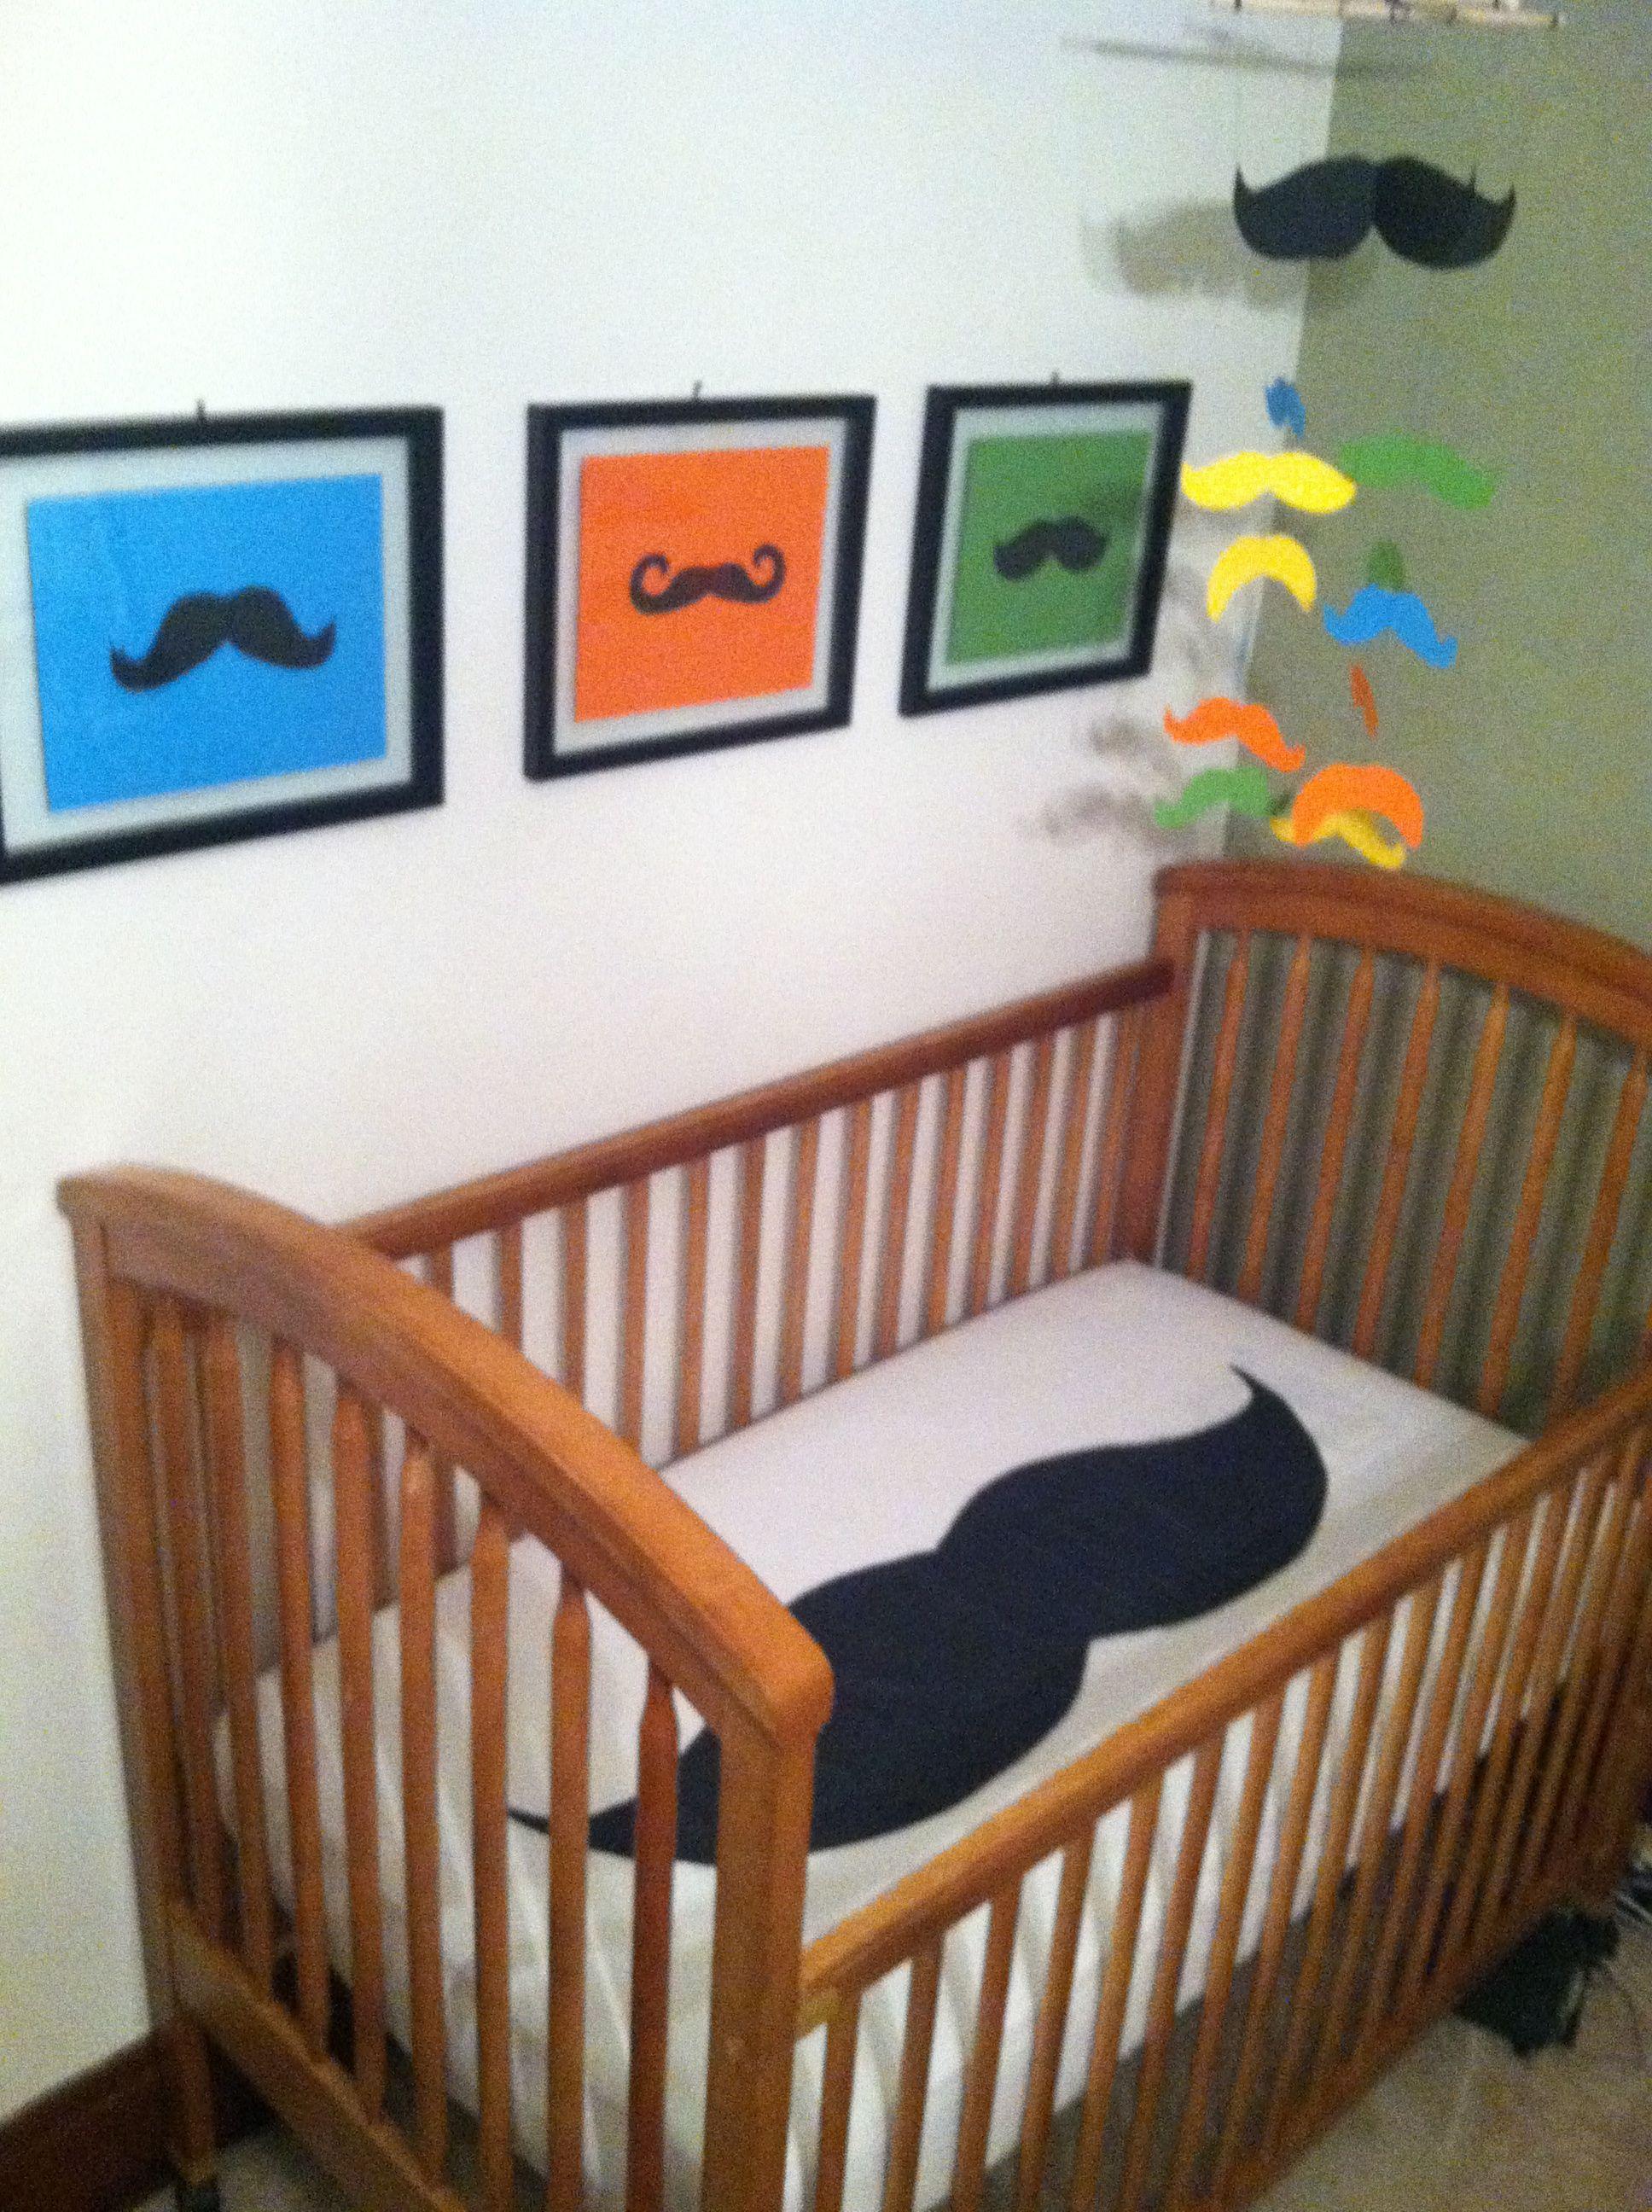 baby boy bedding baby shower gift Mustache crib sheet nursery bedding